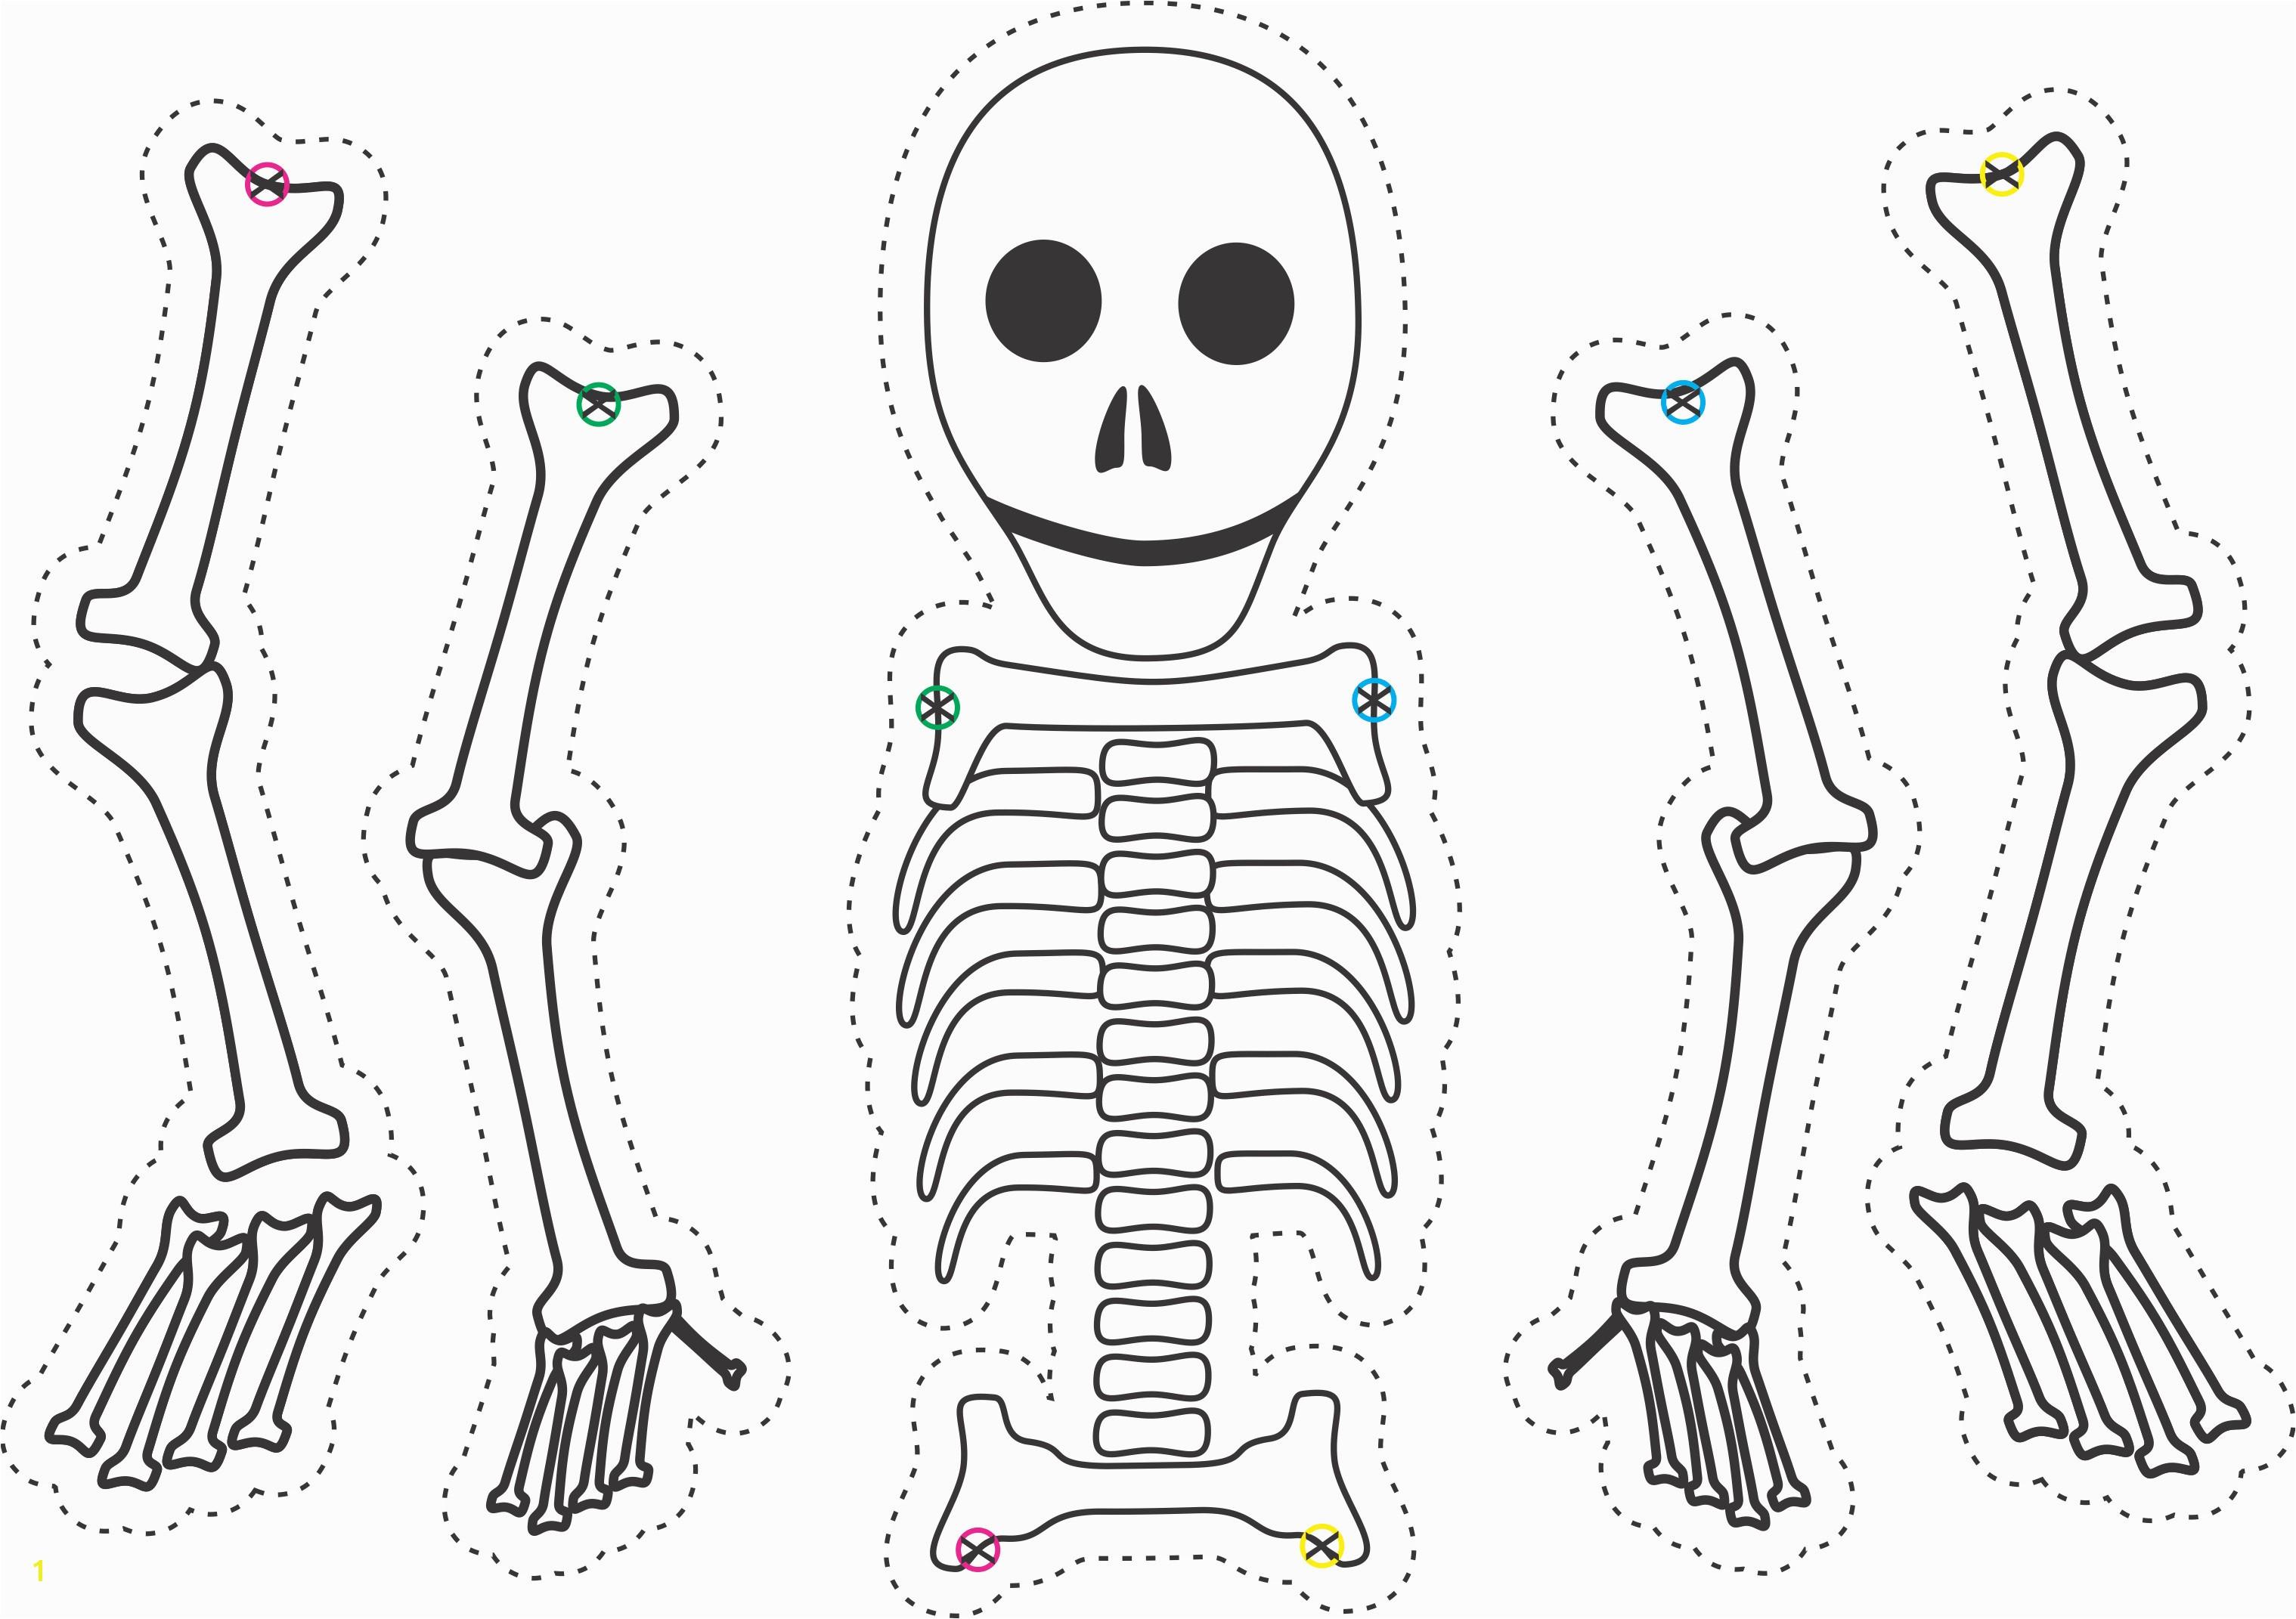 Ezekiel Dry Bones Coloring Page New Printable Human Coloring Book Coloring Page – Coloring Sheets for